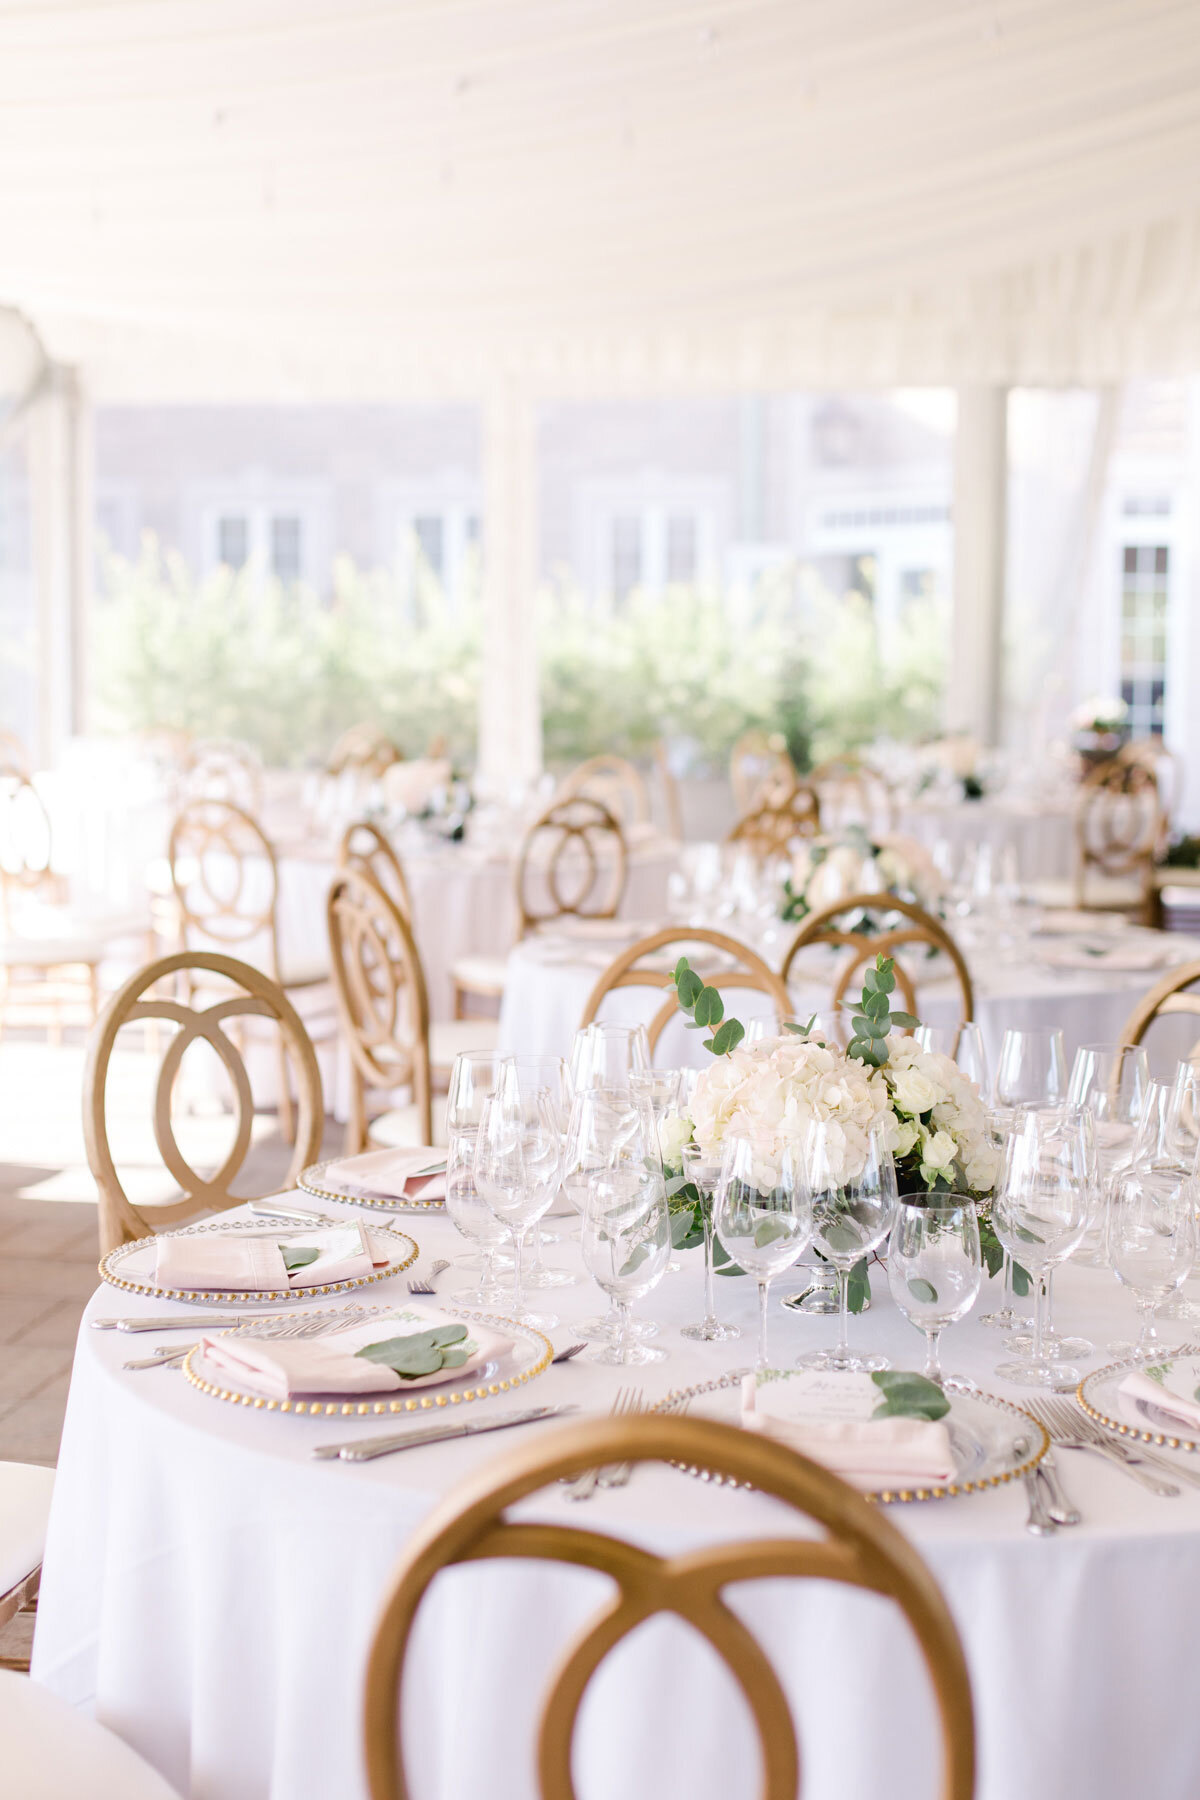 Chateau-des-Charmes-Wedding-Summer-Vineyard-Bride-Niagara-on-the-Lake-photos-by-Gemini-Photography-Ontario-0059.jpg